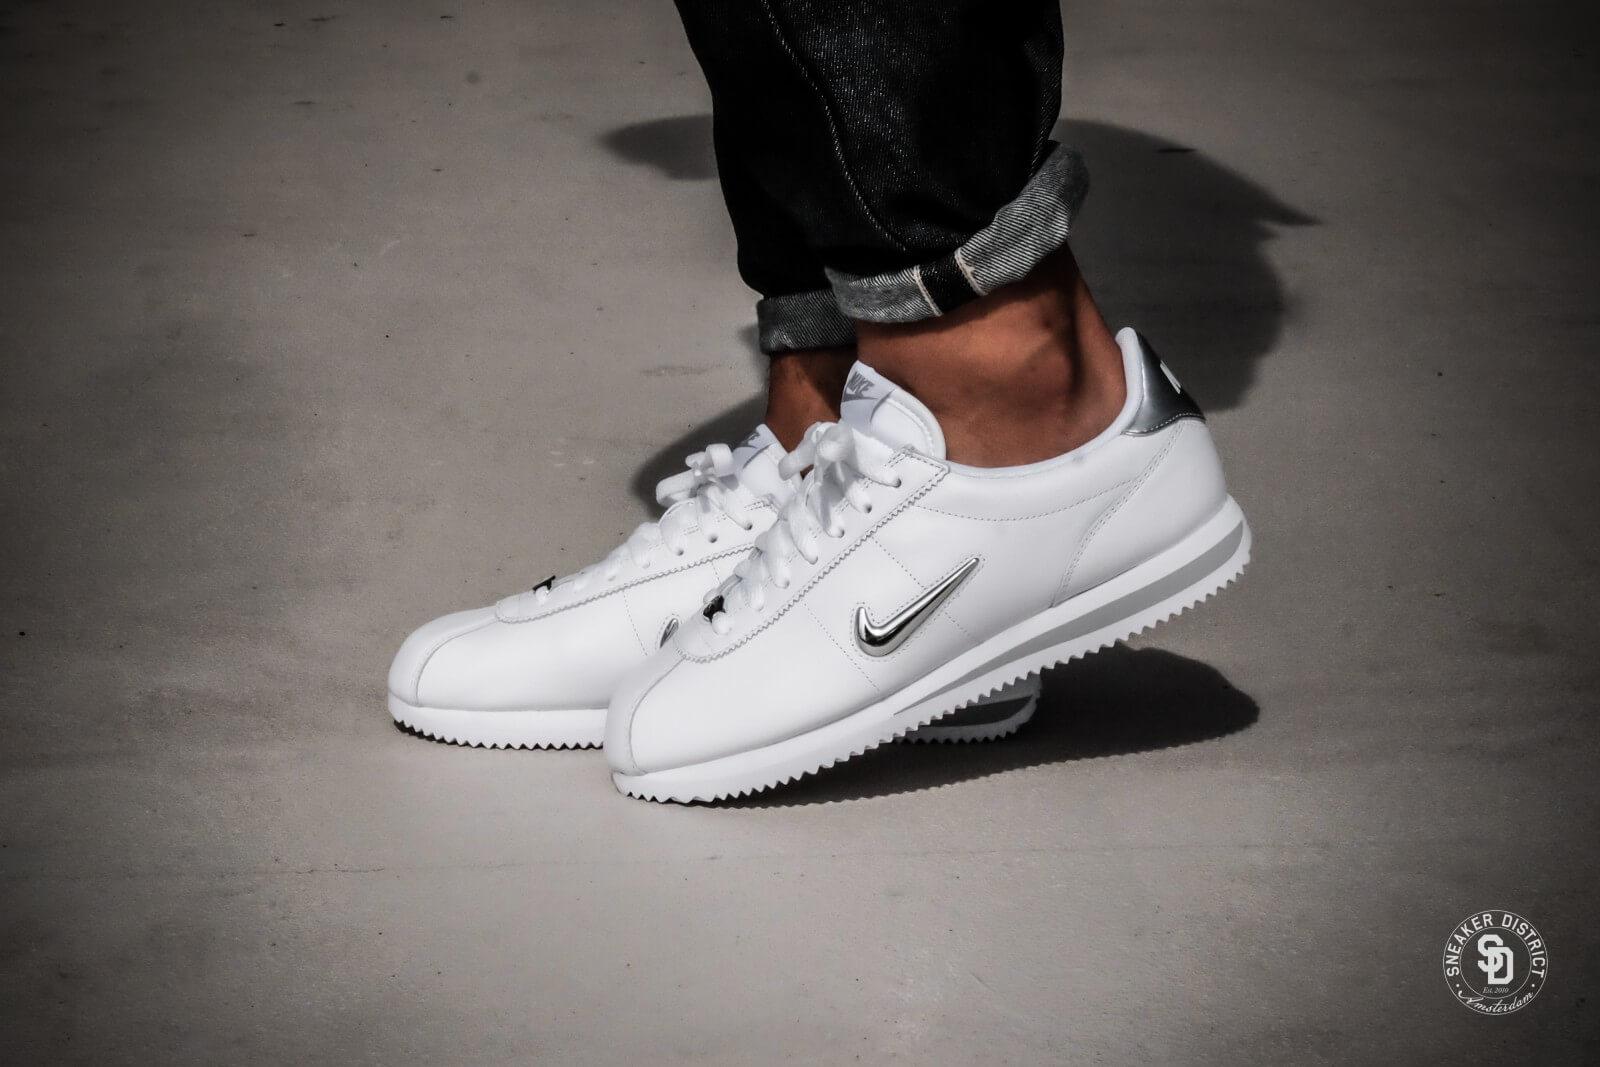 Nike Cortez Basic Jewel WhiteMetallic Silver 833238 101